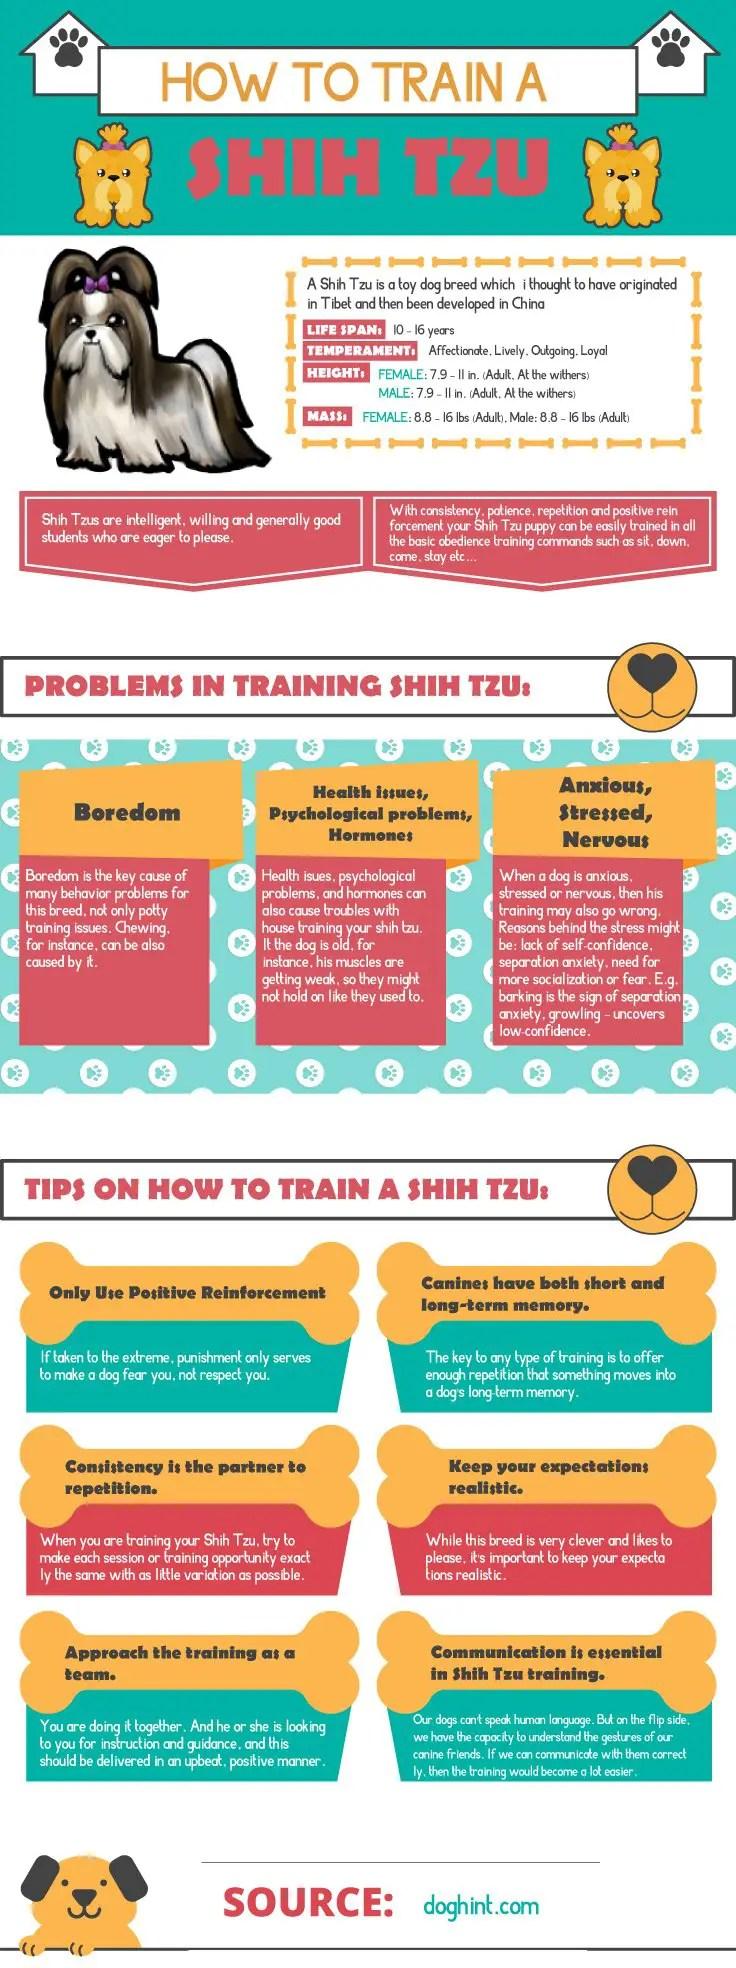 how to train a shih tzu doghint.com